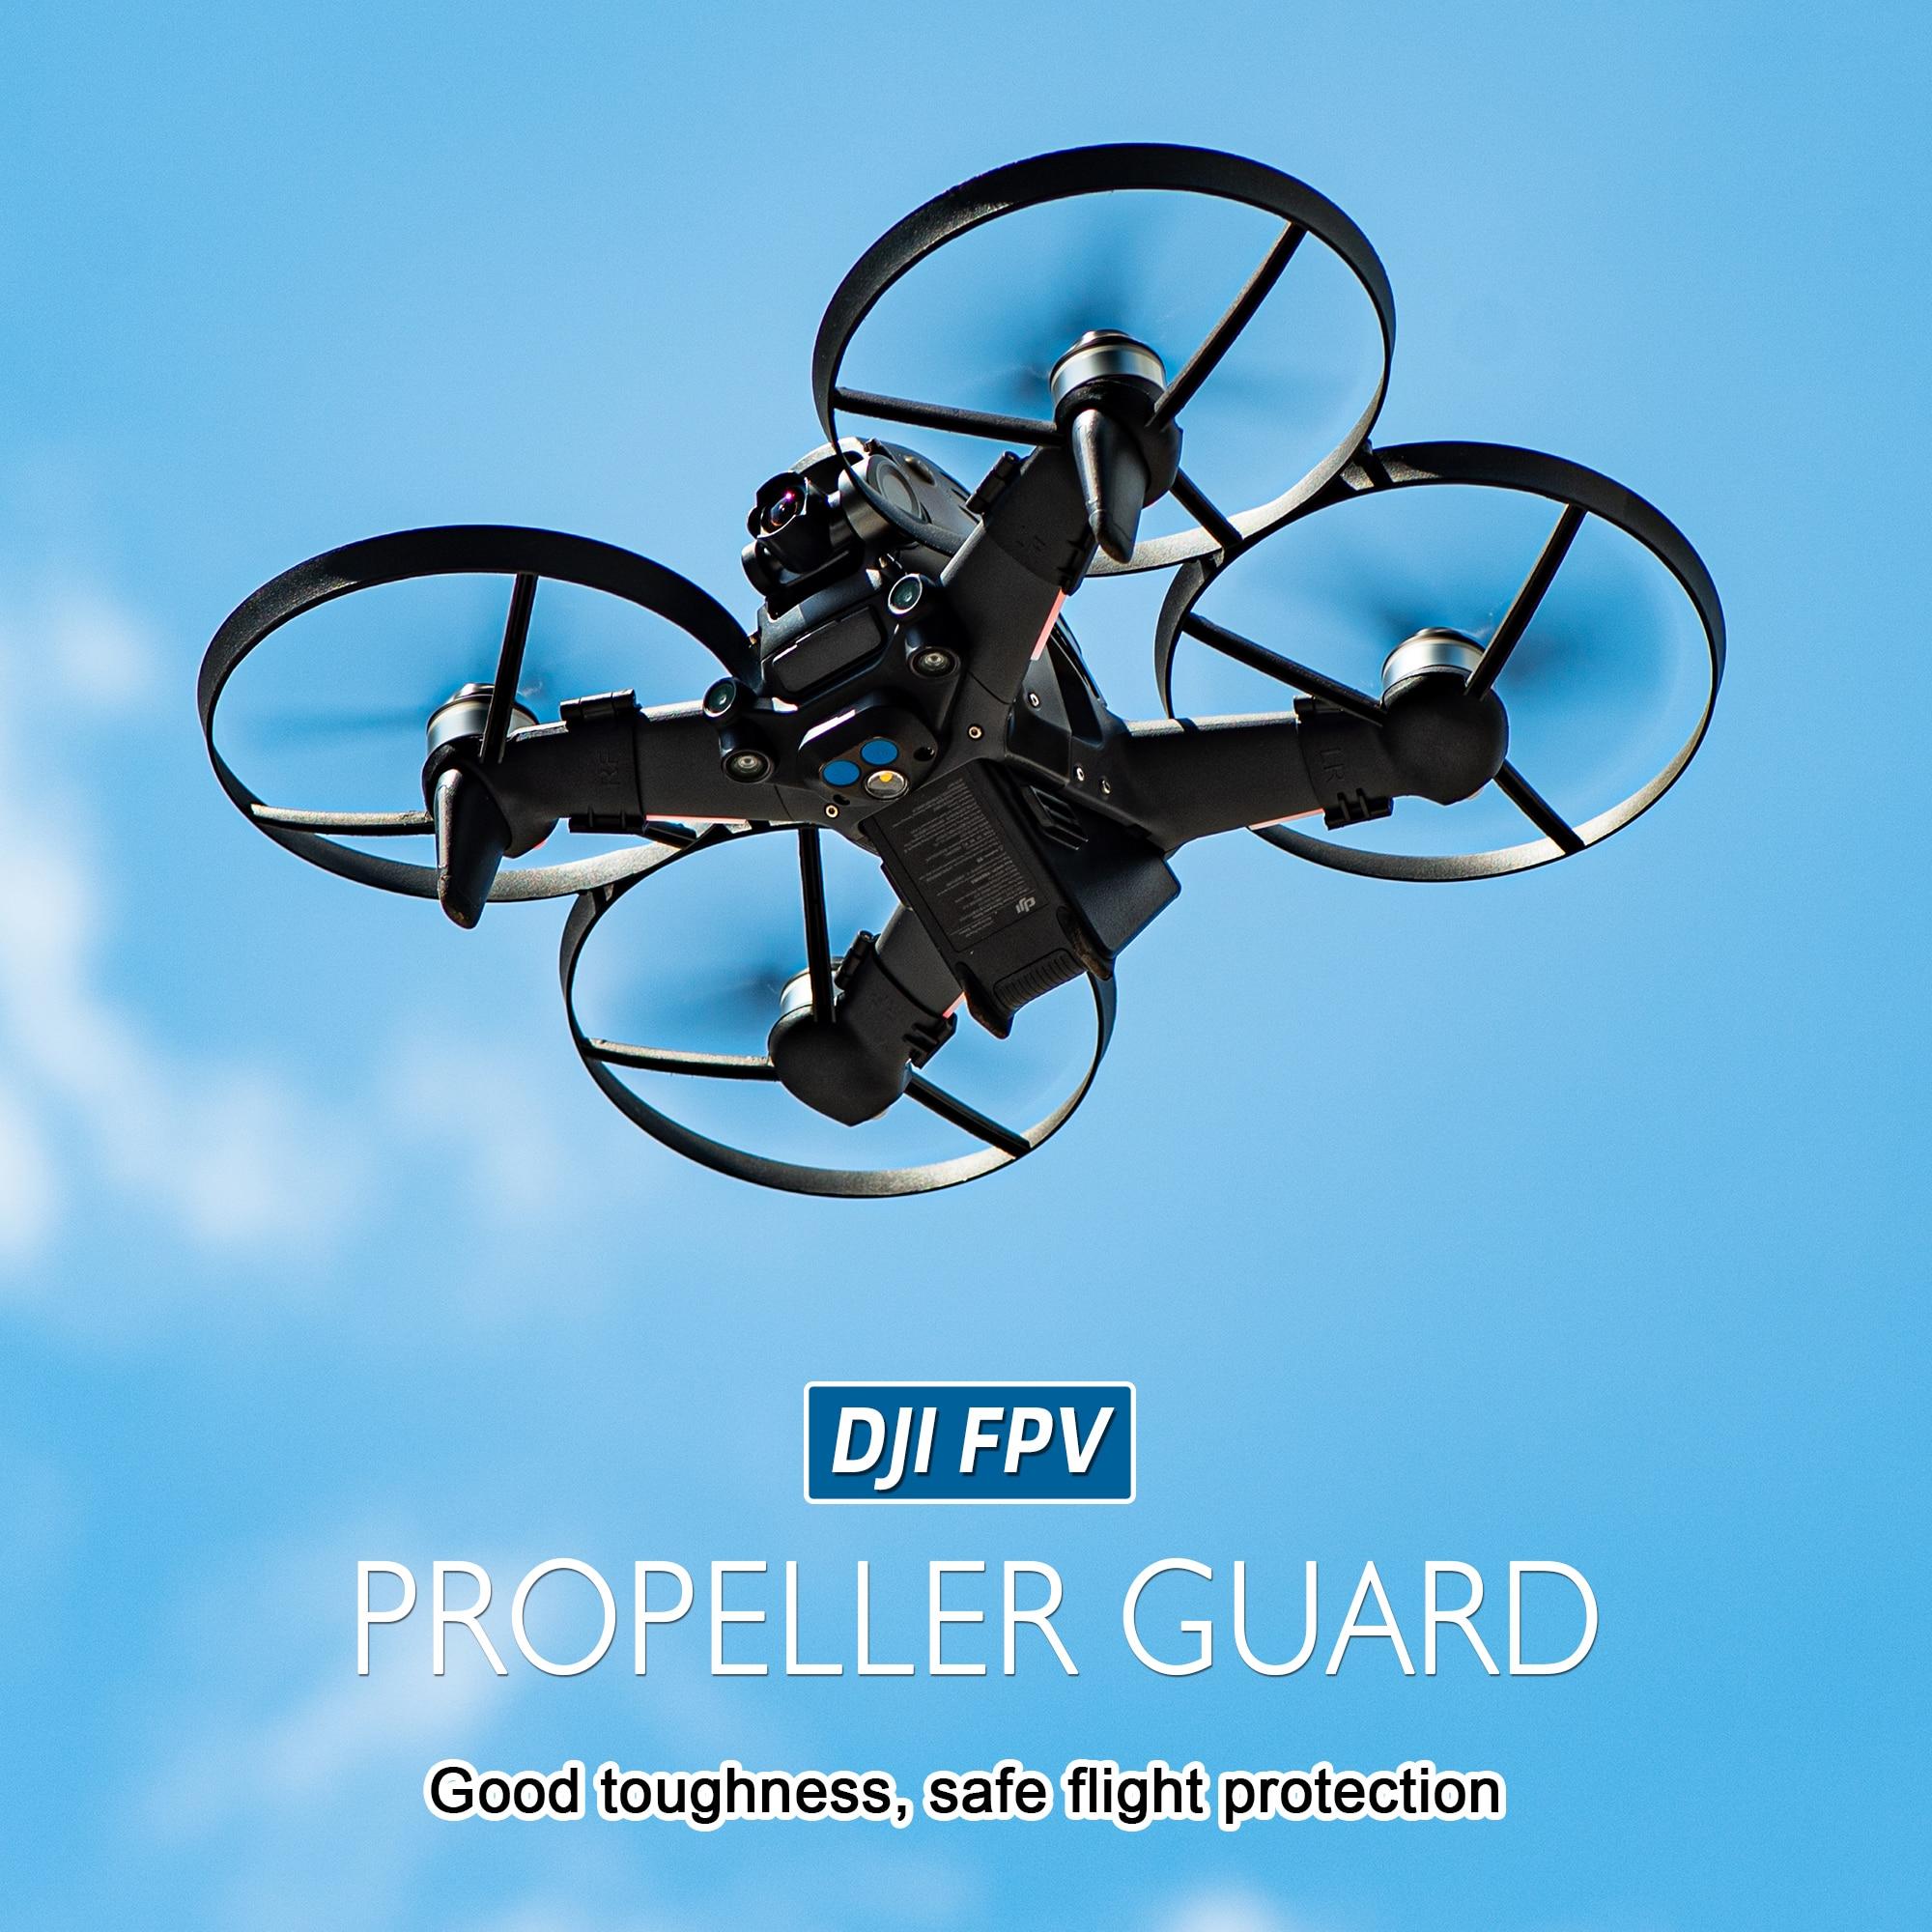 protectores-de-helice-de-dron-helices-integradas-dji-fpv-anillos-de-blindaje-protector-para-dji-fpv-accesorios-para-dron